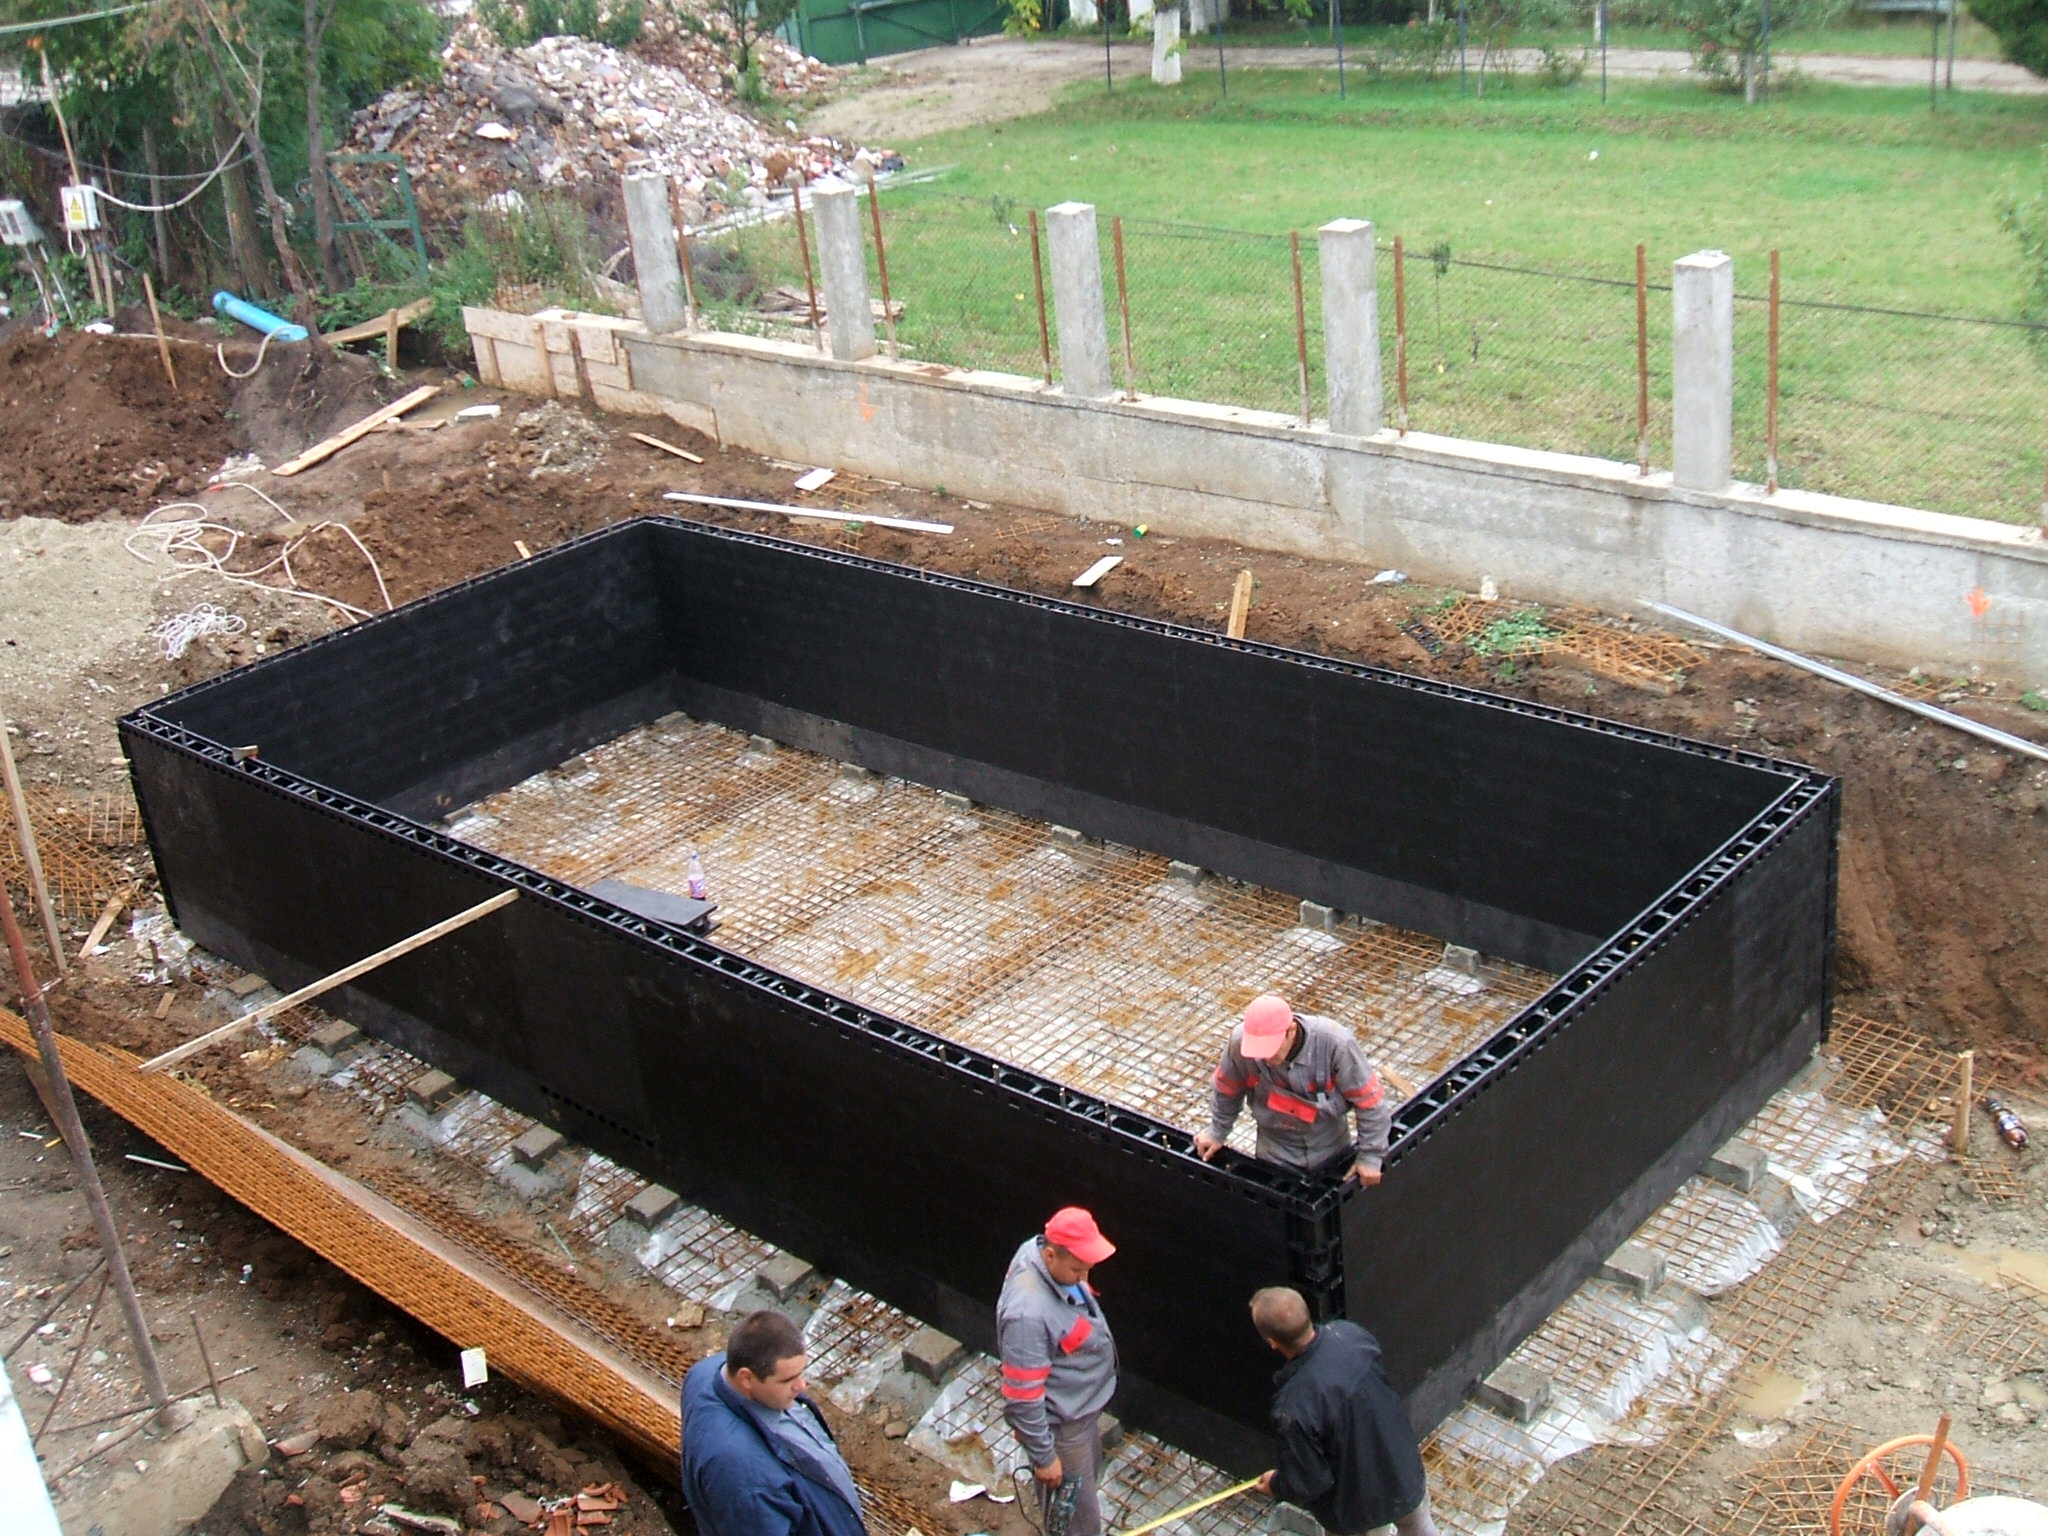 Piscina privata din beton cu cofrag pierdut - Faze montaj 10 MONDIAL PISCINE - Poza 10